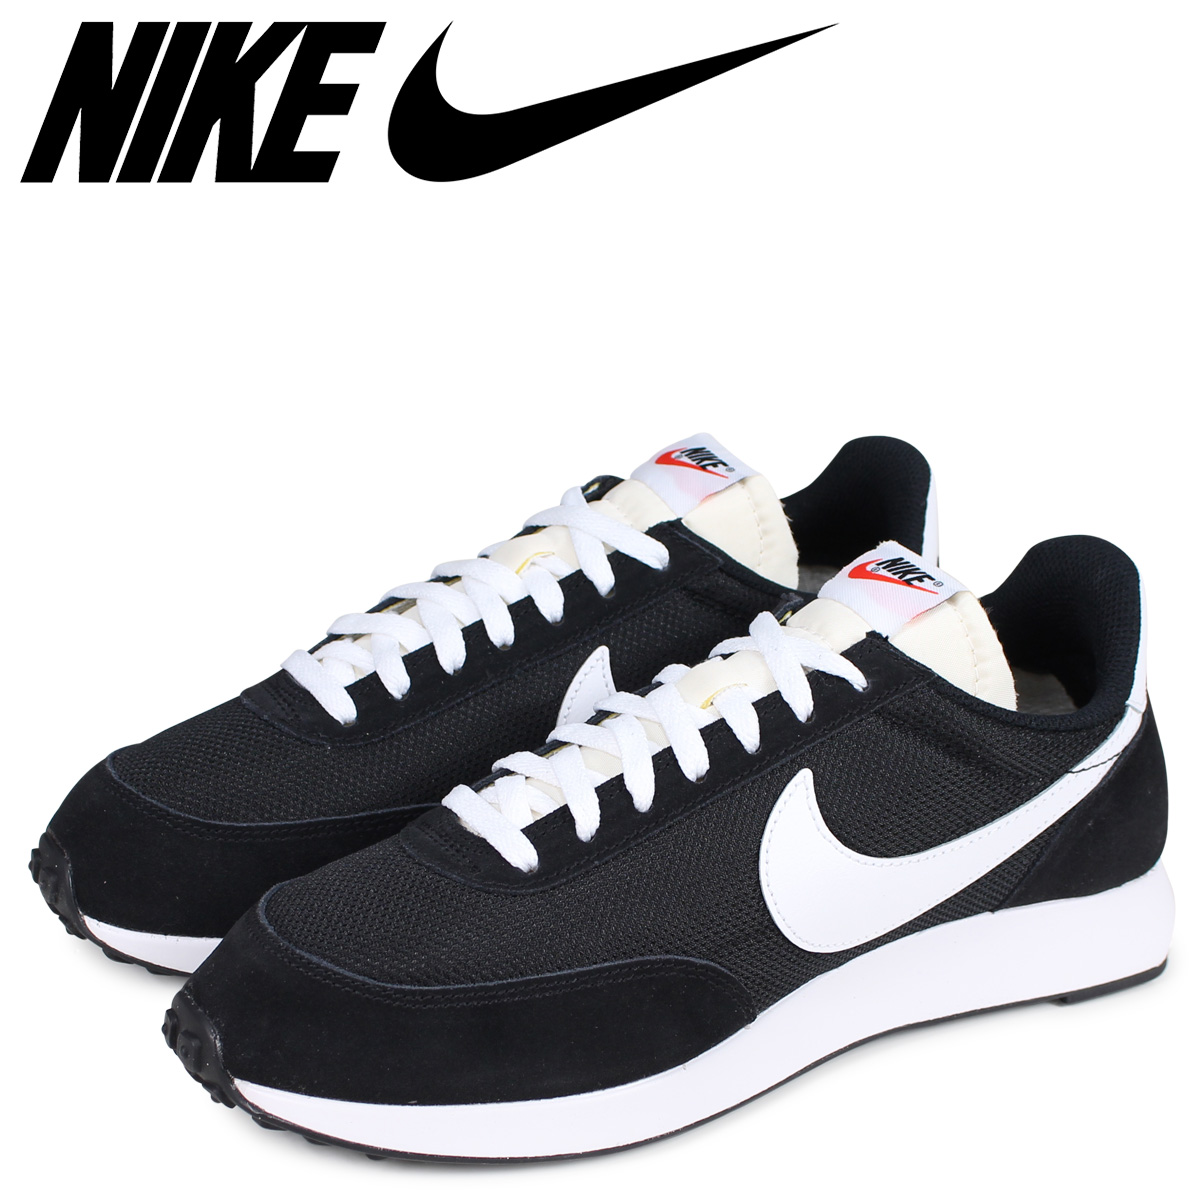 premium selection c567d 142d8 NIKE Kie Ney expectation yl wind 79 sneakers men AIR TAILWIND 79 black  black 487,754-009